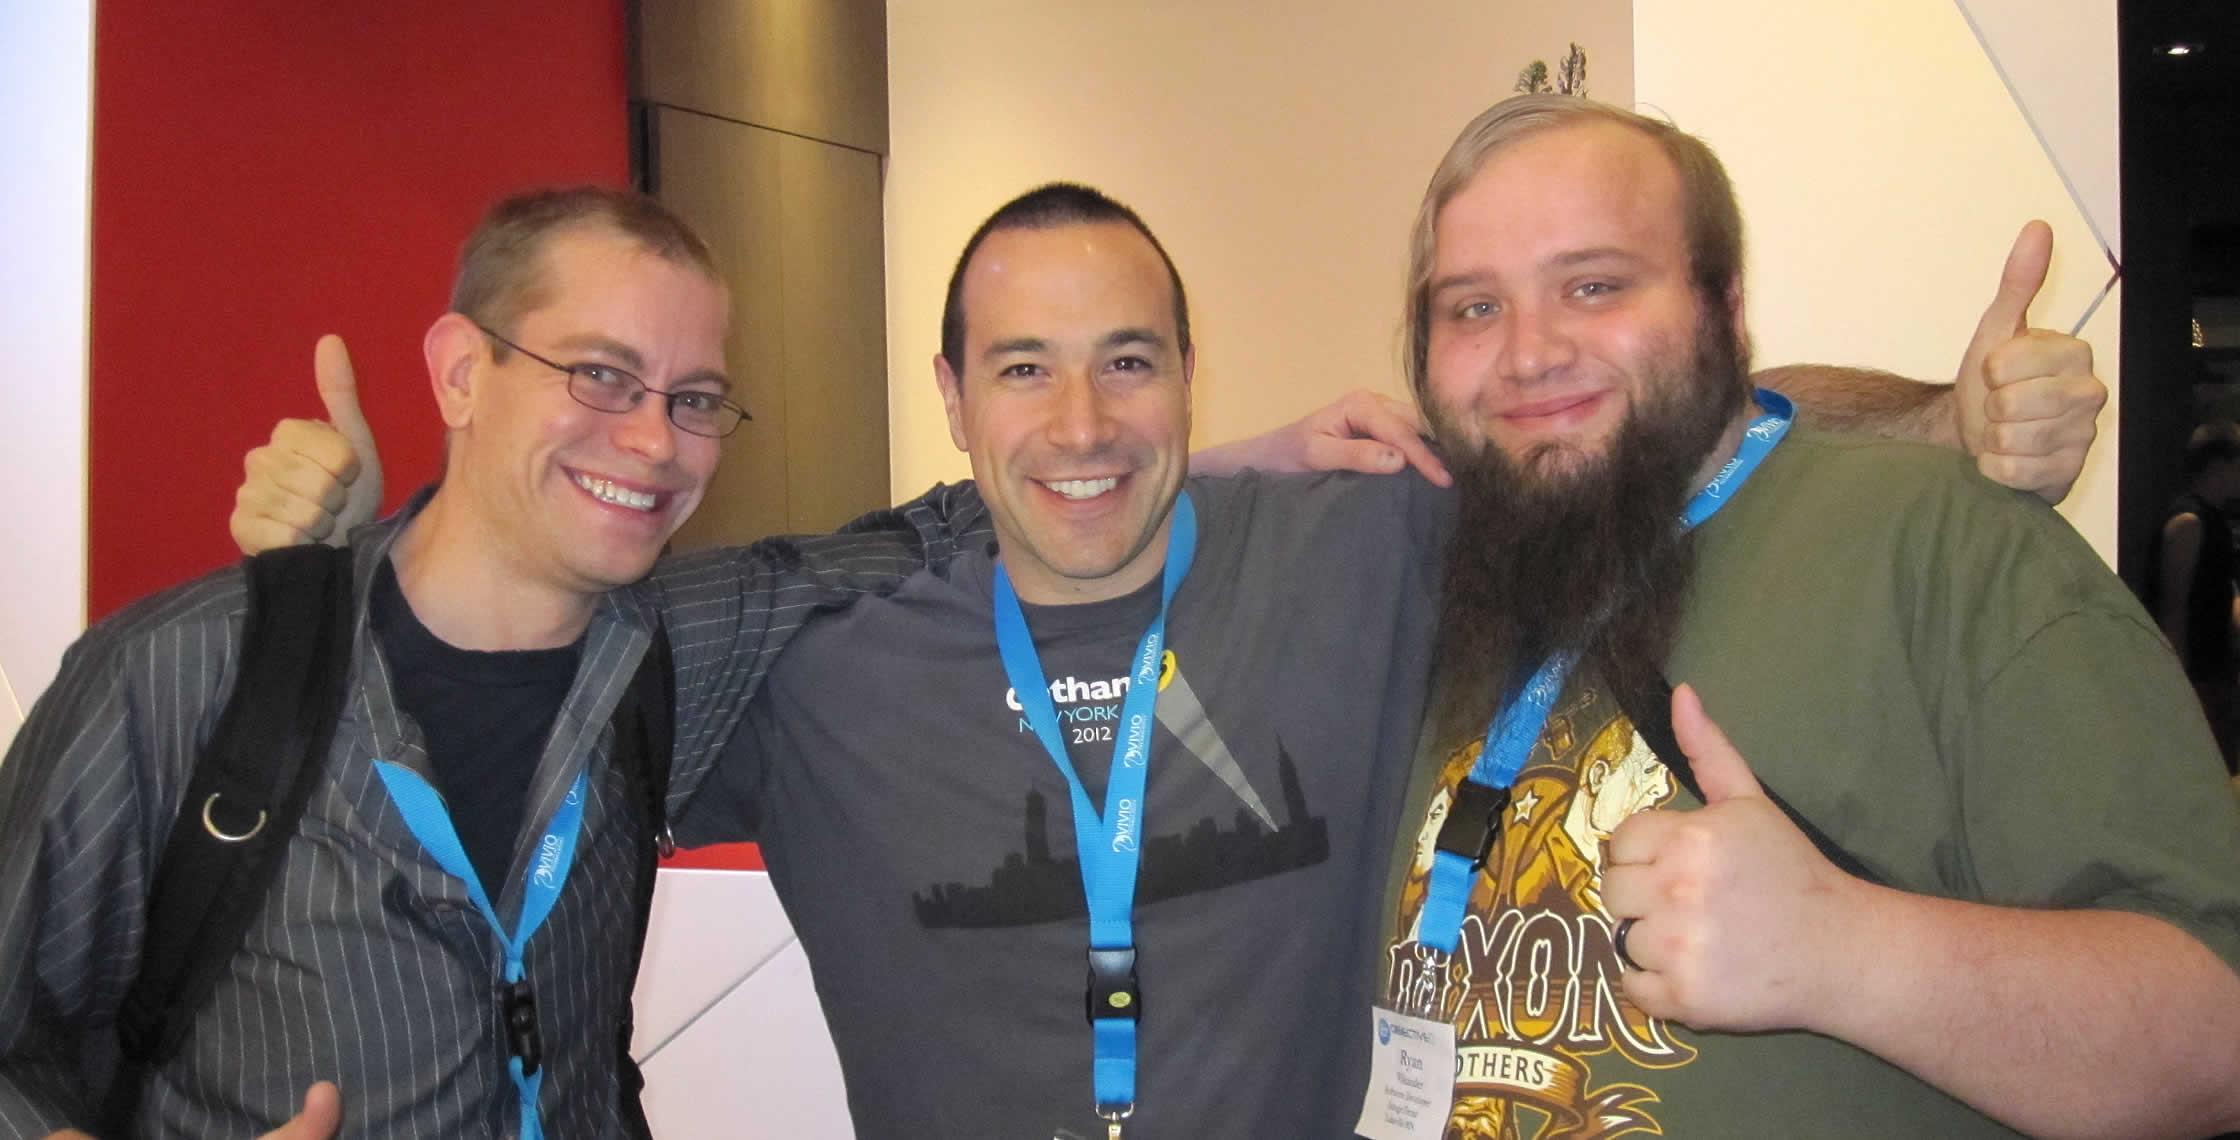 Ben Nadel at cf.Objective() 2013 (Bloomington, MN) with: Josh Knutson and Ryan Vikander